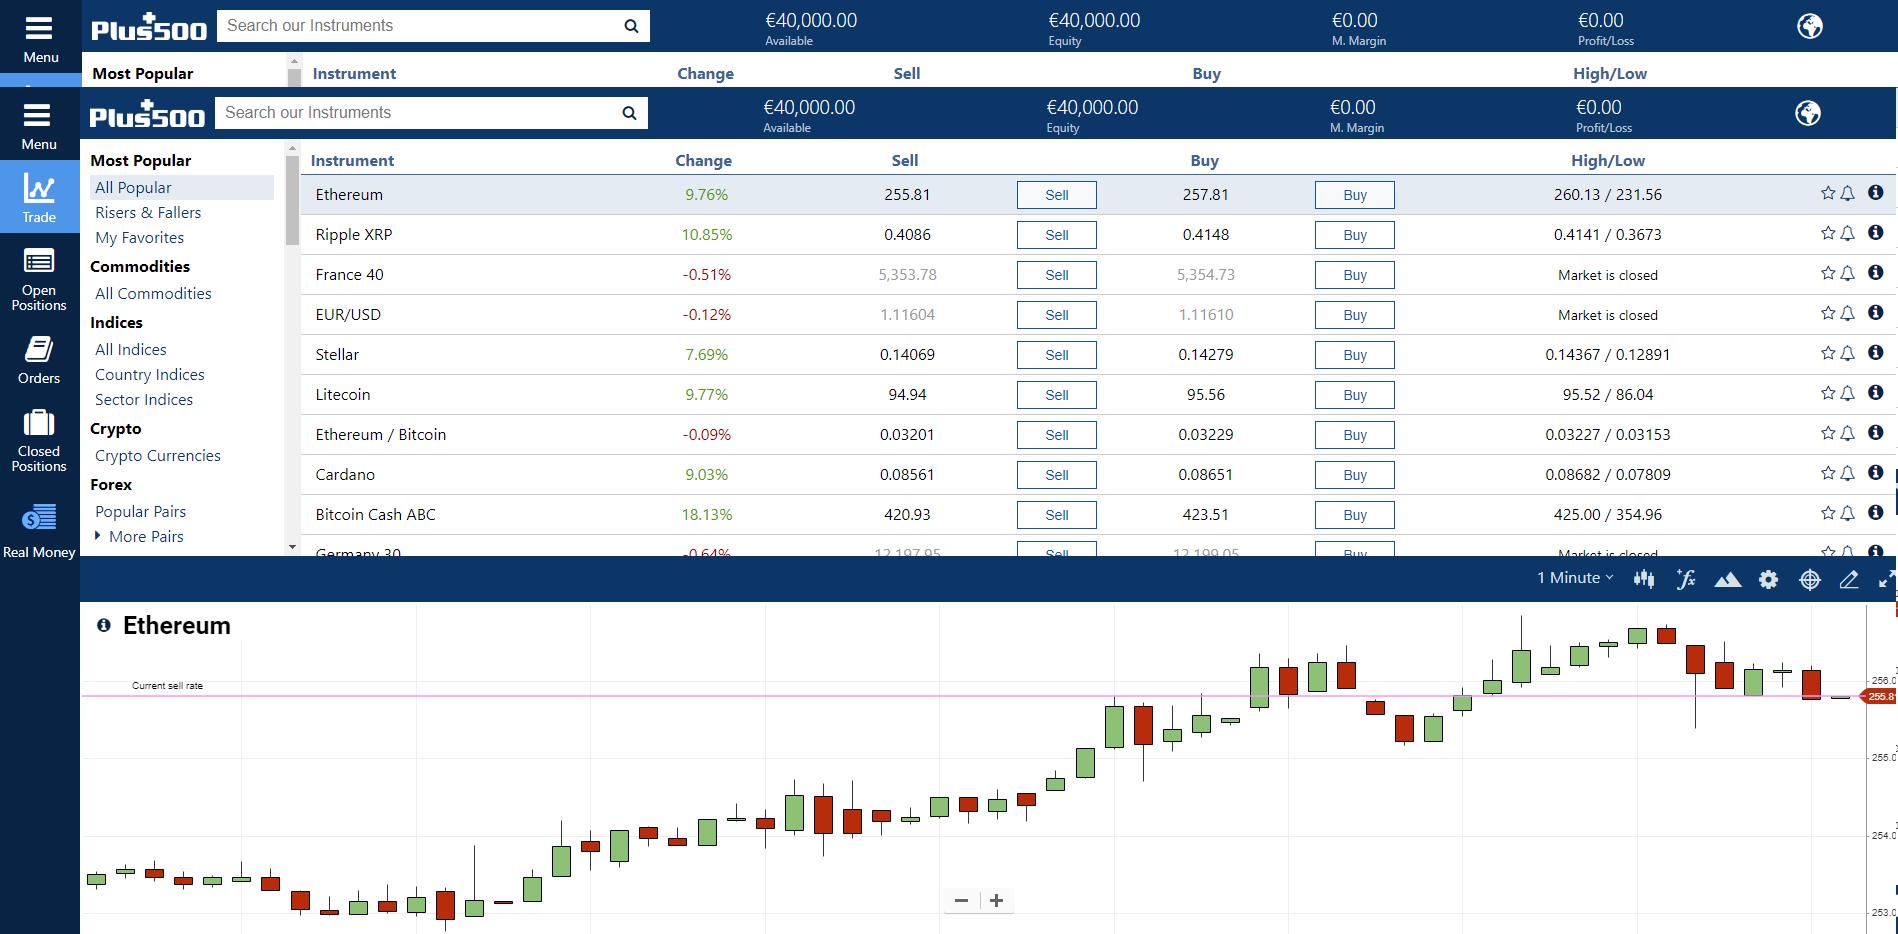 Forex Brokers kínál Bitcoin Trading